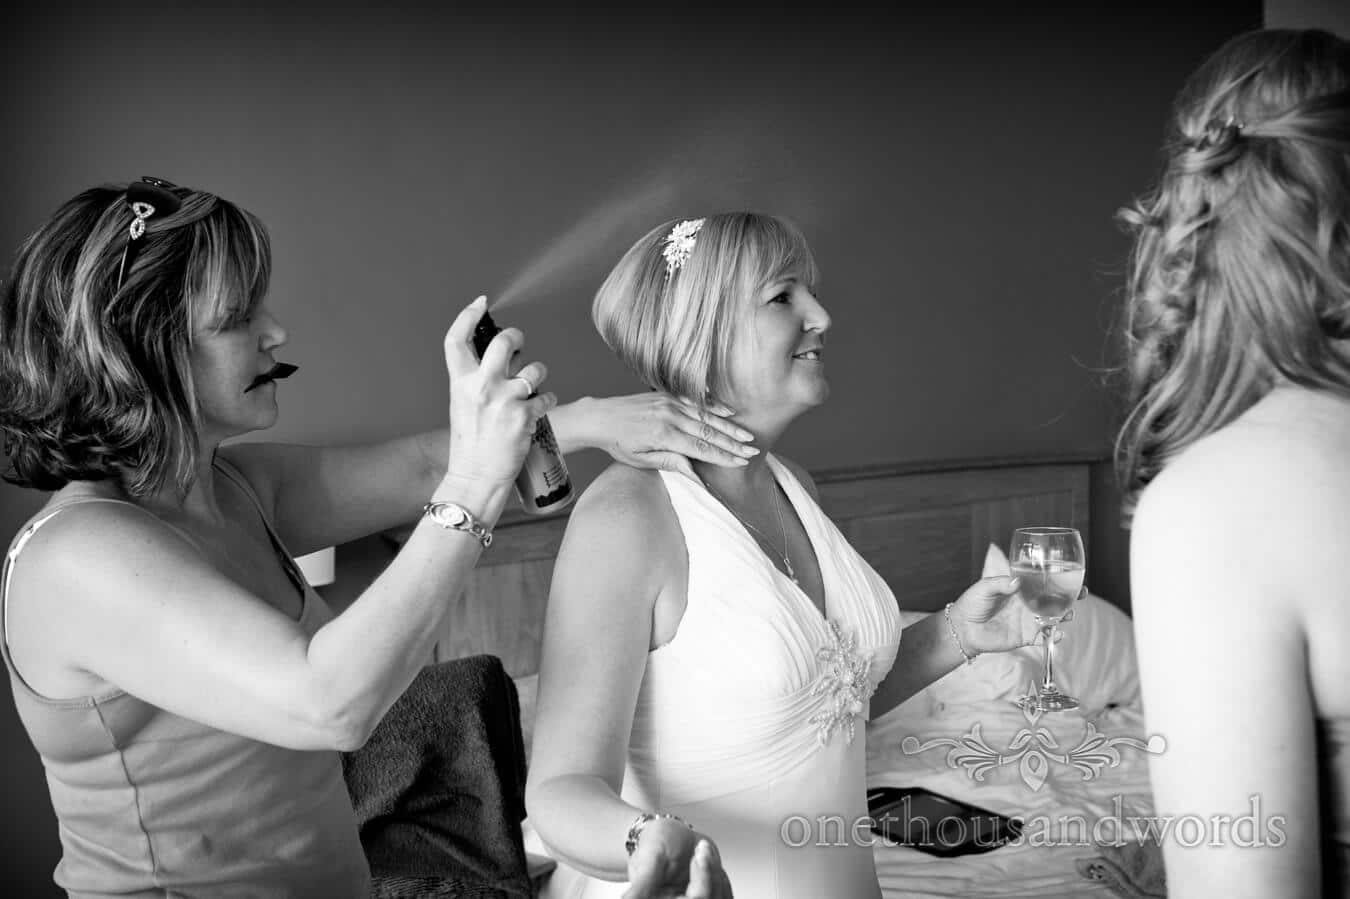 Bride has hair styled on beach theme wedding morning